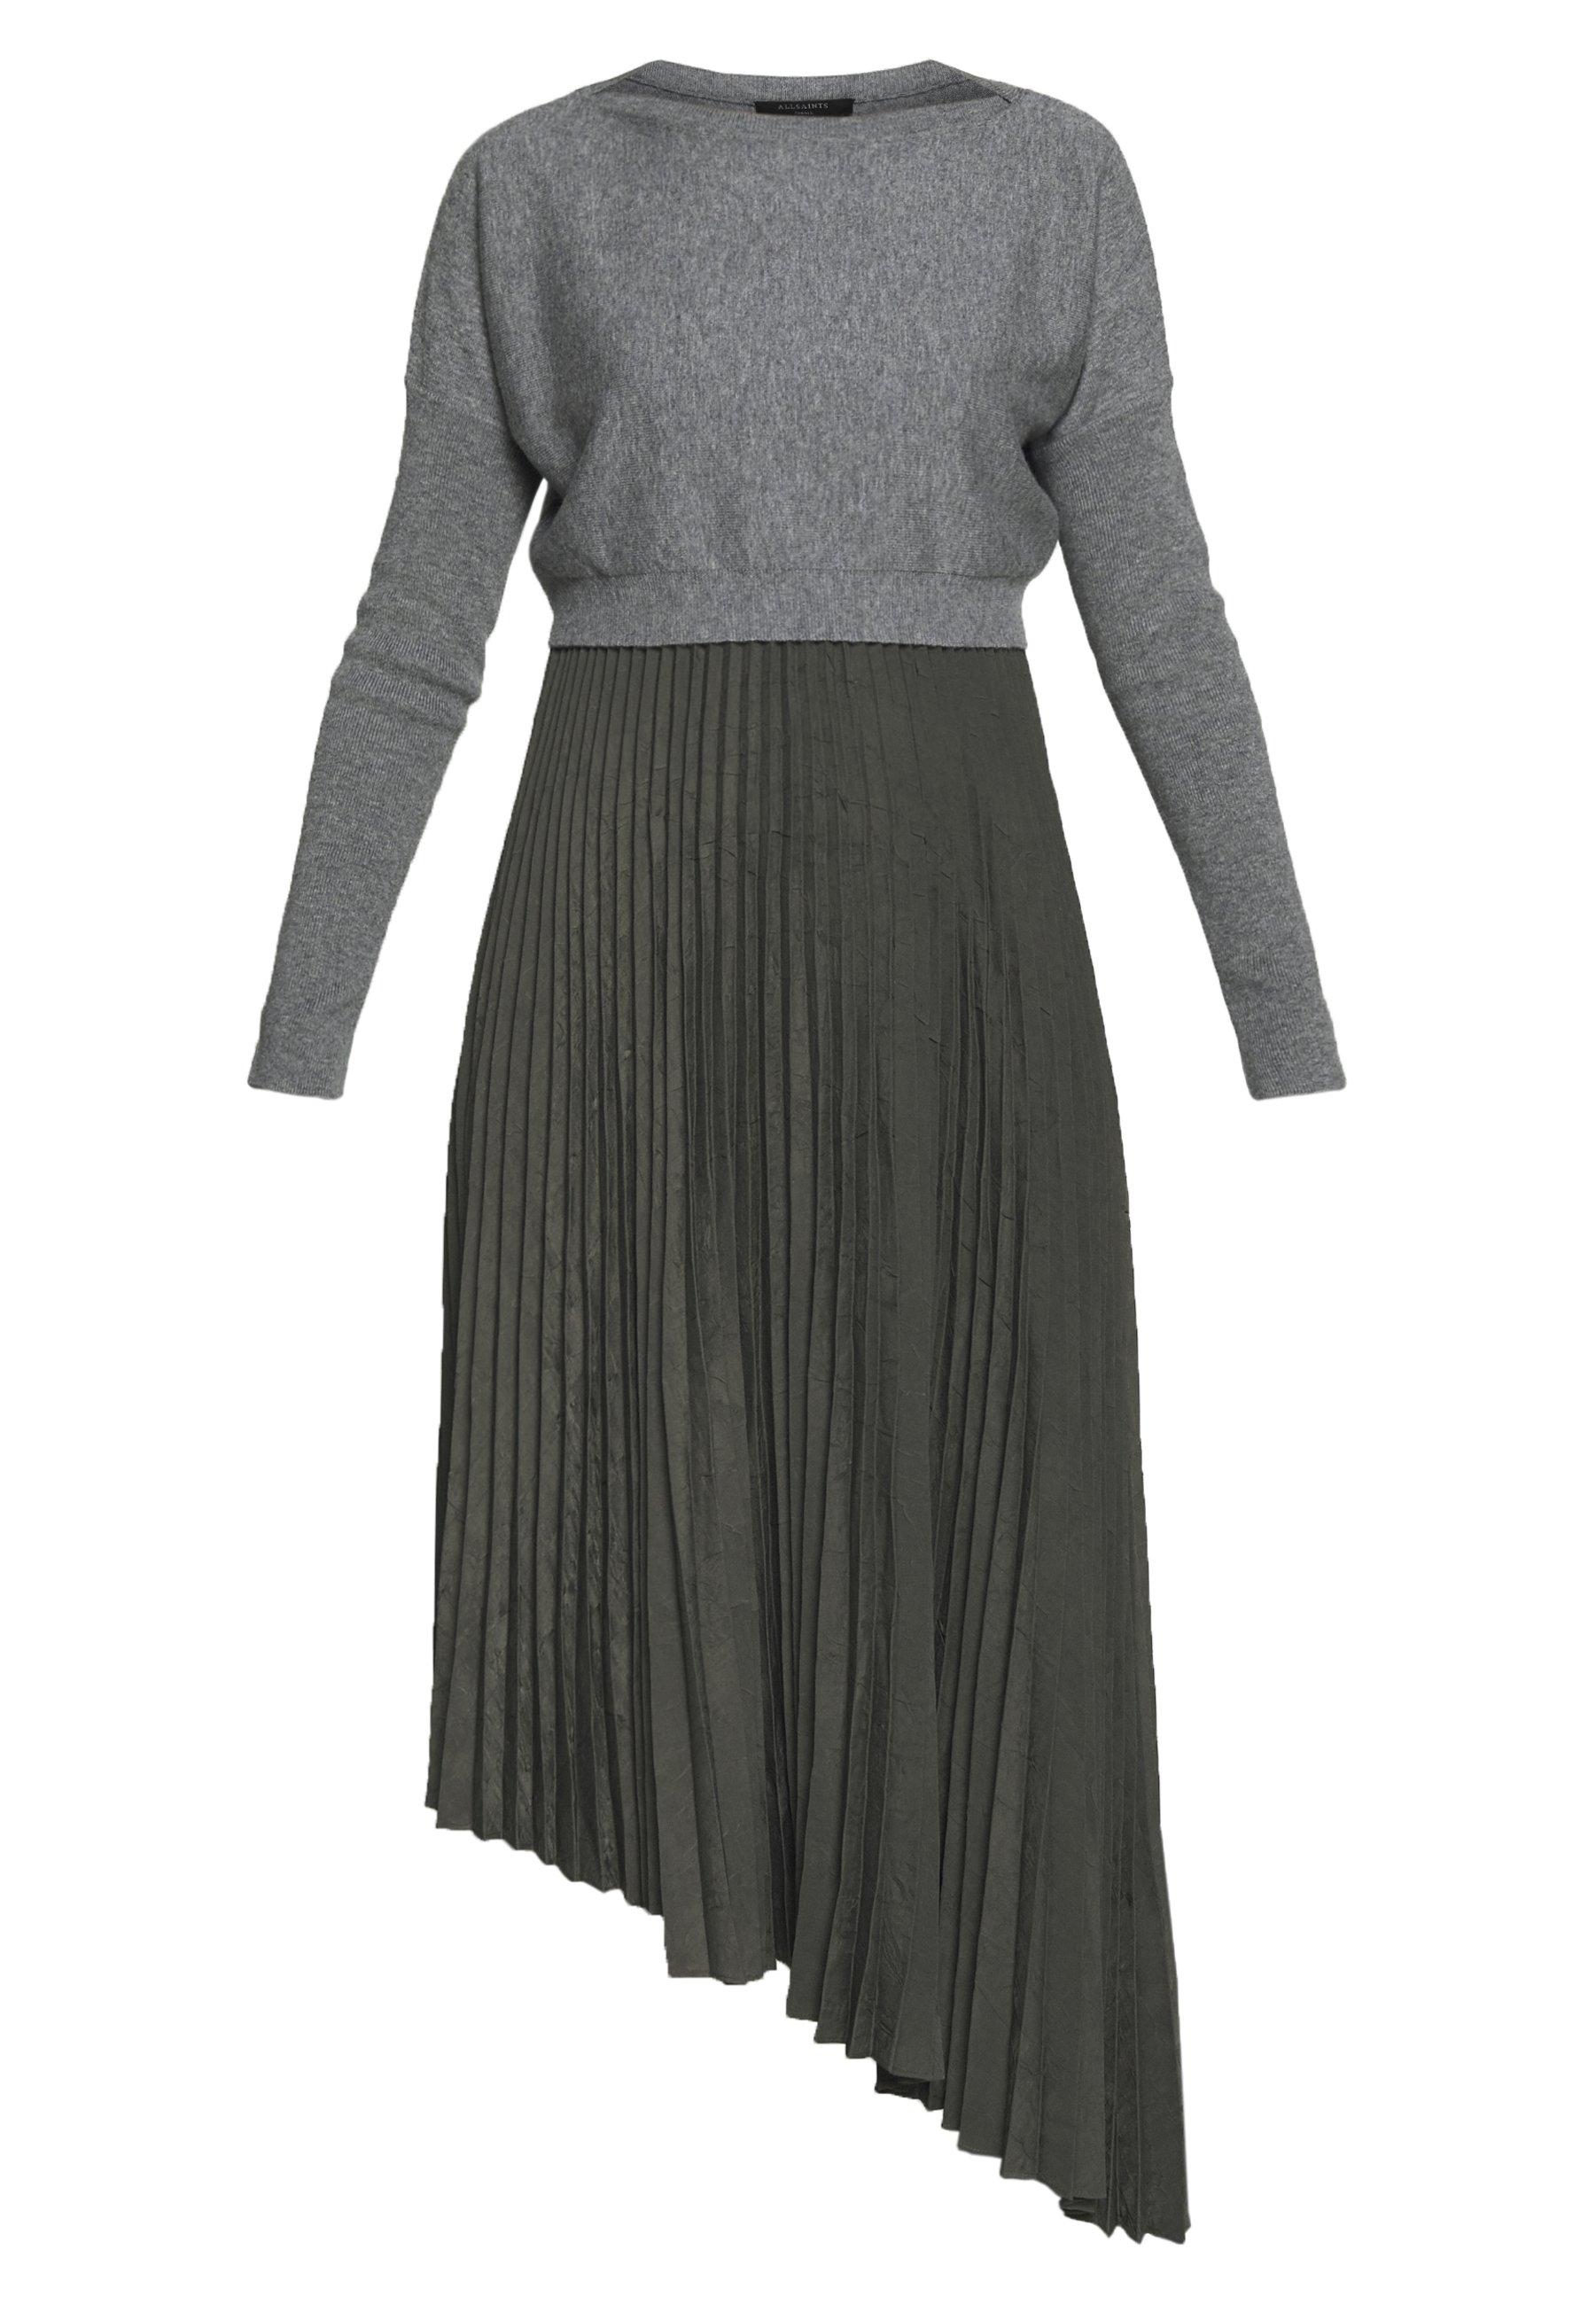 AllSaints EVETTA DRESS 2 IN 1 - Sweter - khaki/grey